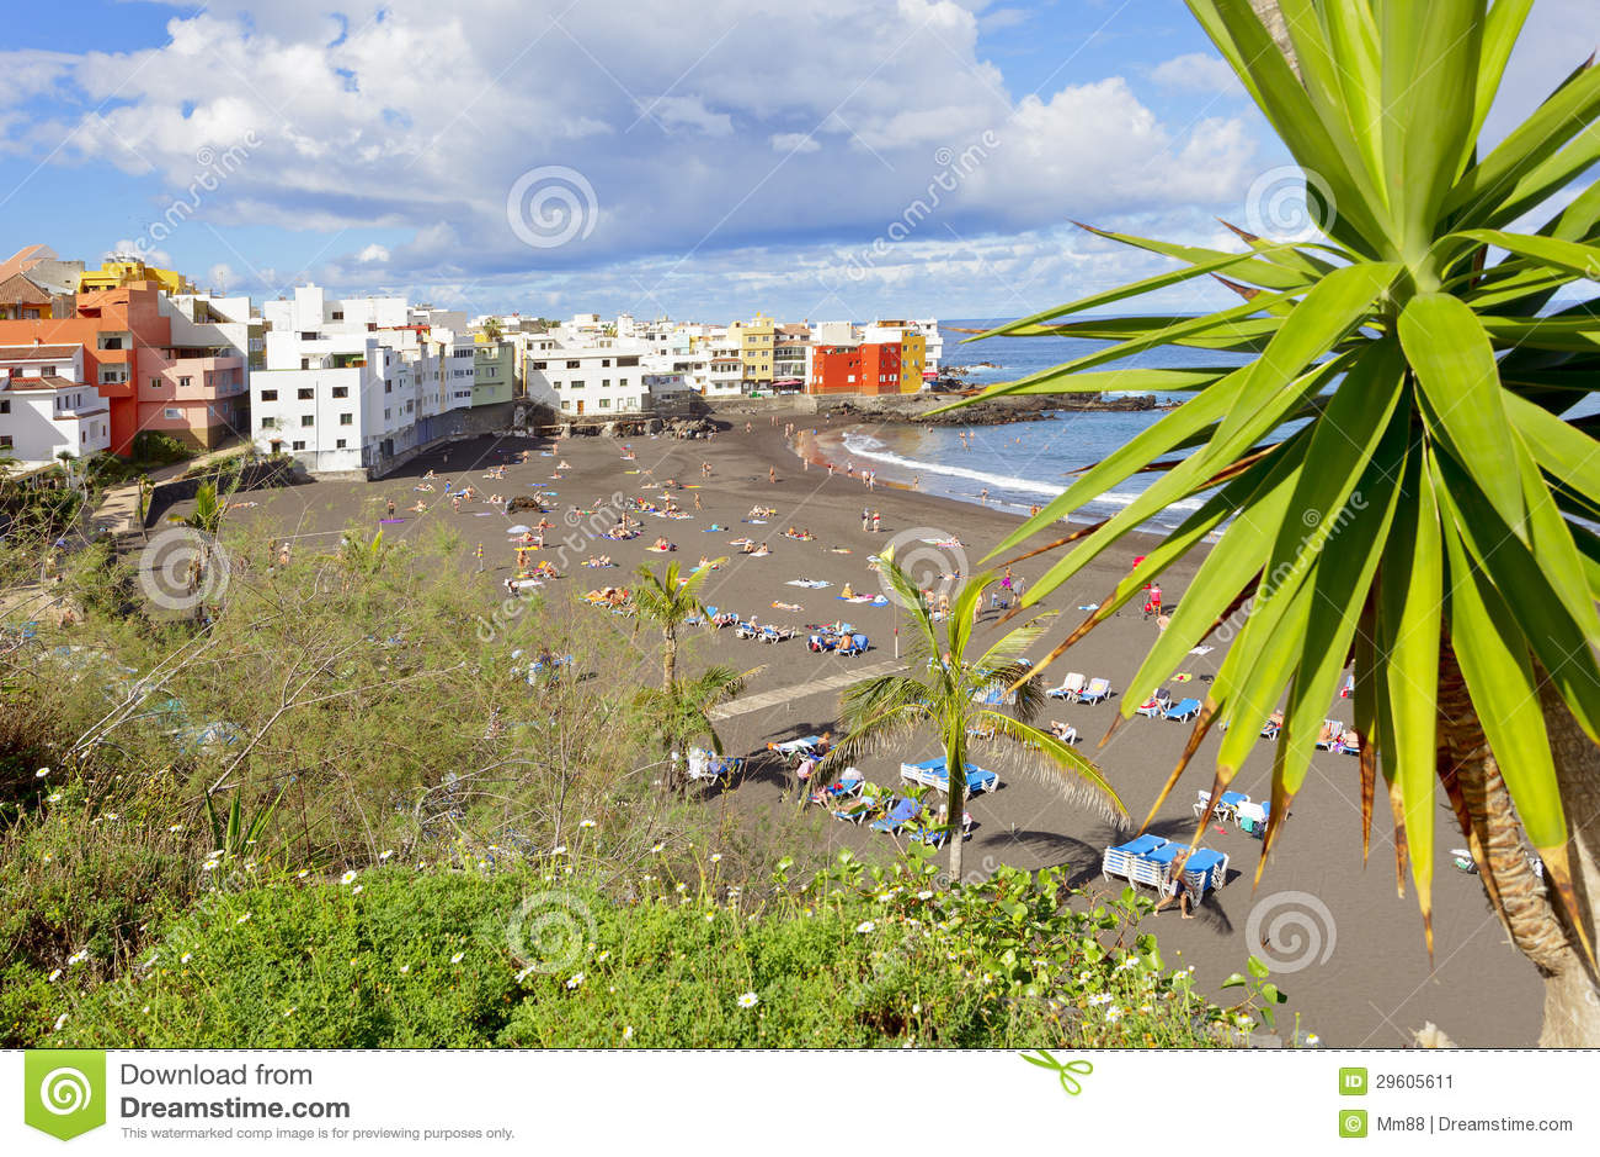 Playa de jardin stock image image 29605611 for Aparthotel jardin de playa